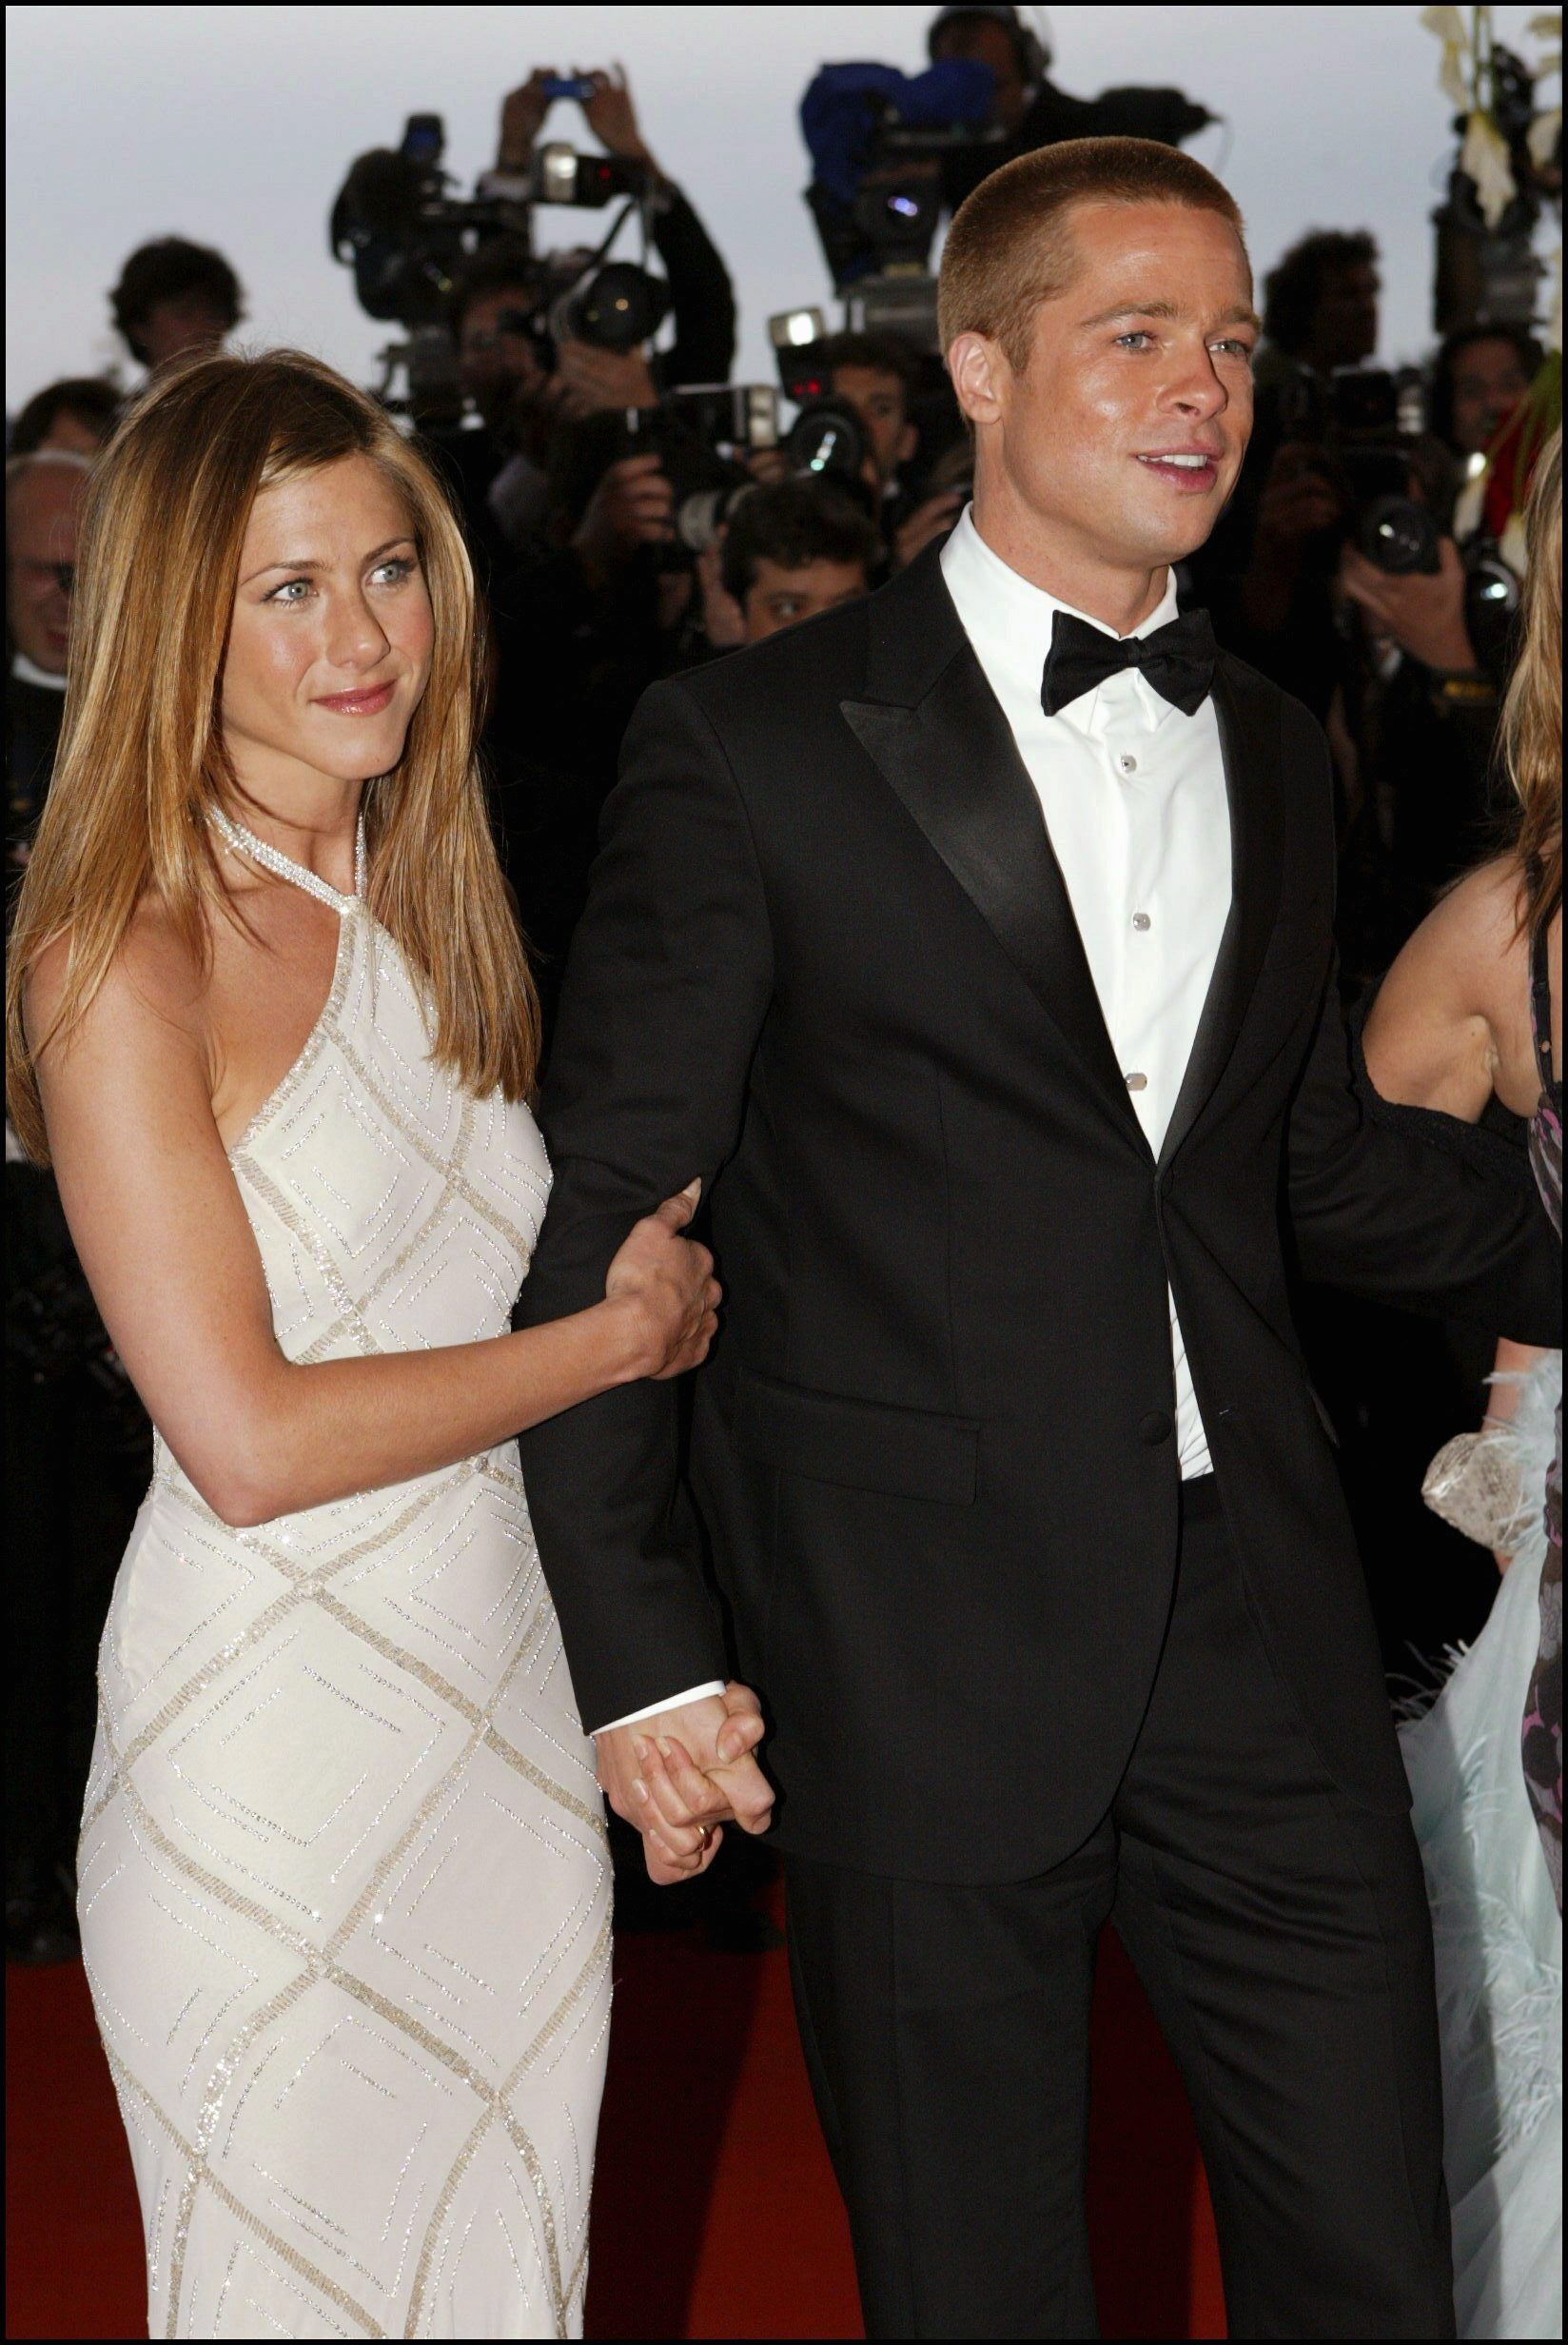 18 Celebrity Divorces We Never Saw Coming